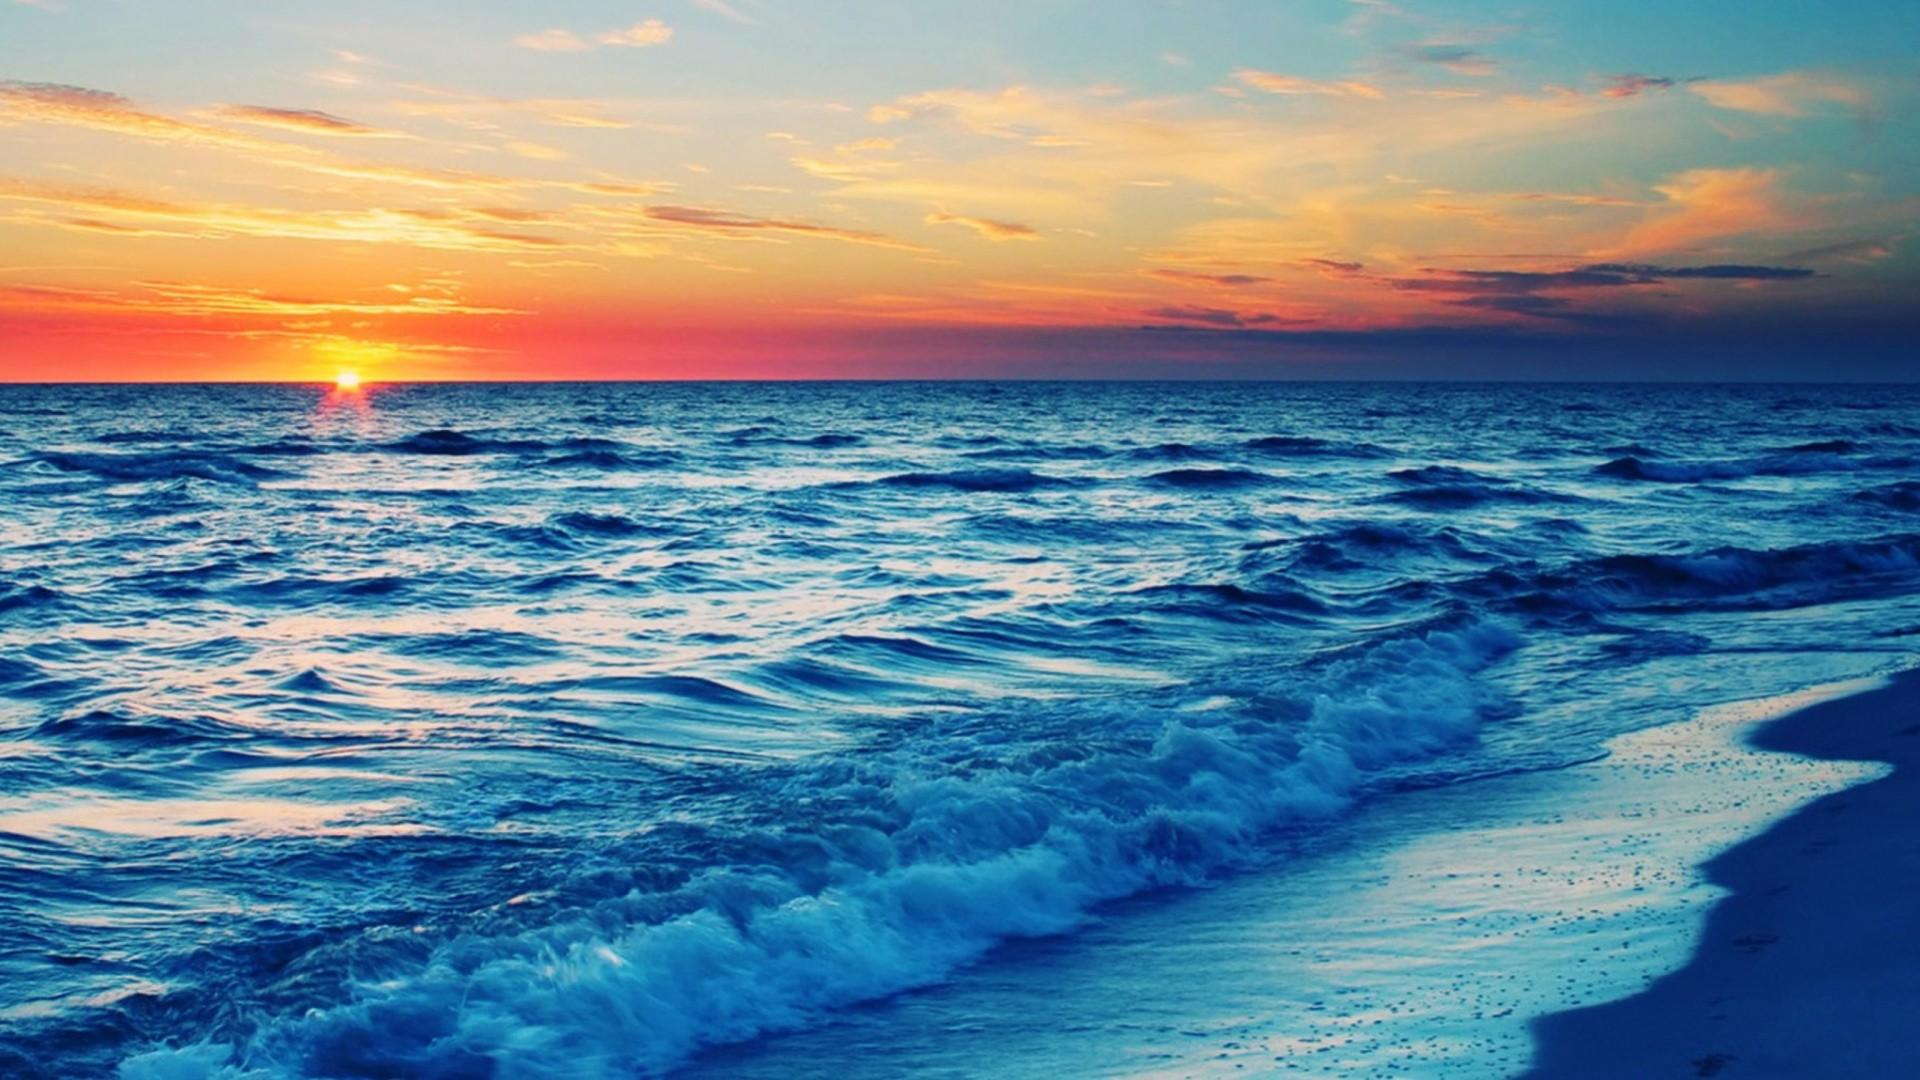 Beach At Sunset wallpaperwallpaper screensaver .